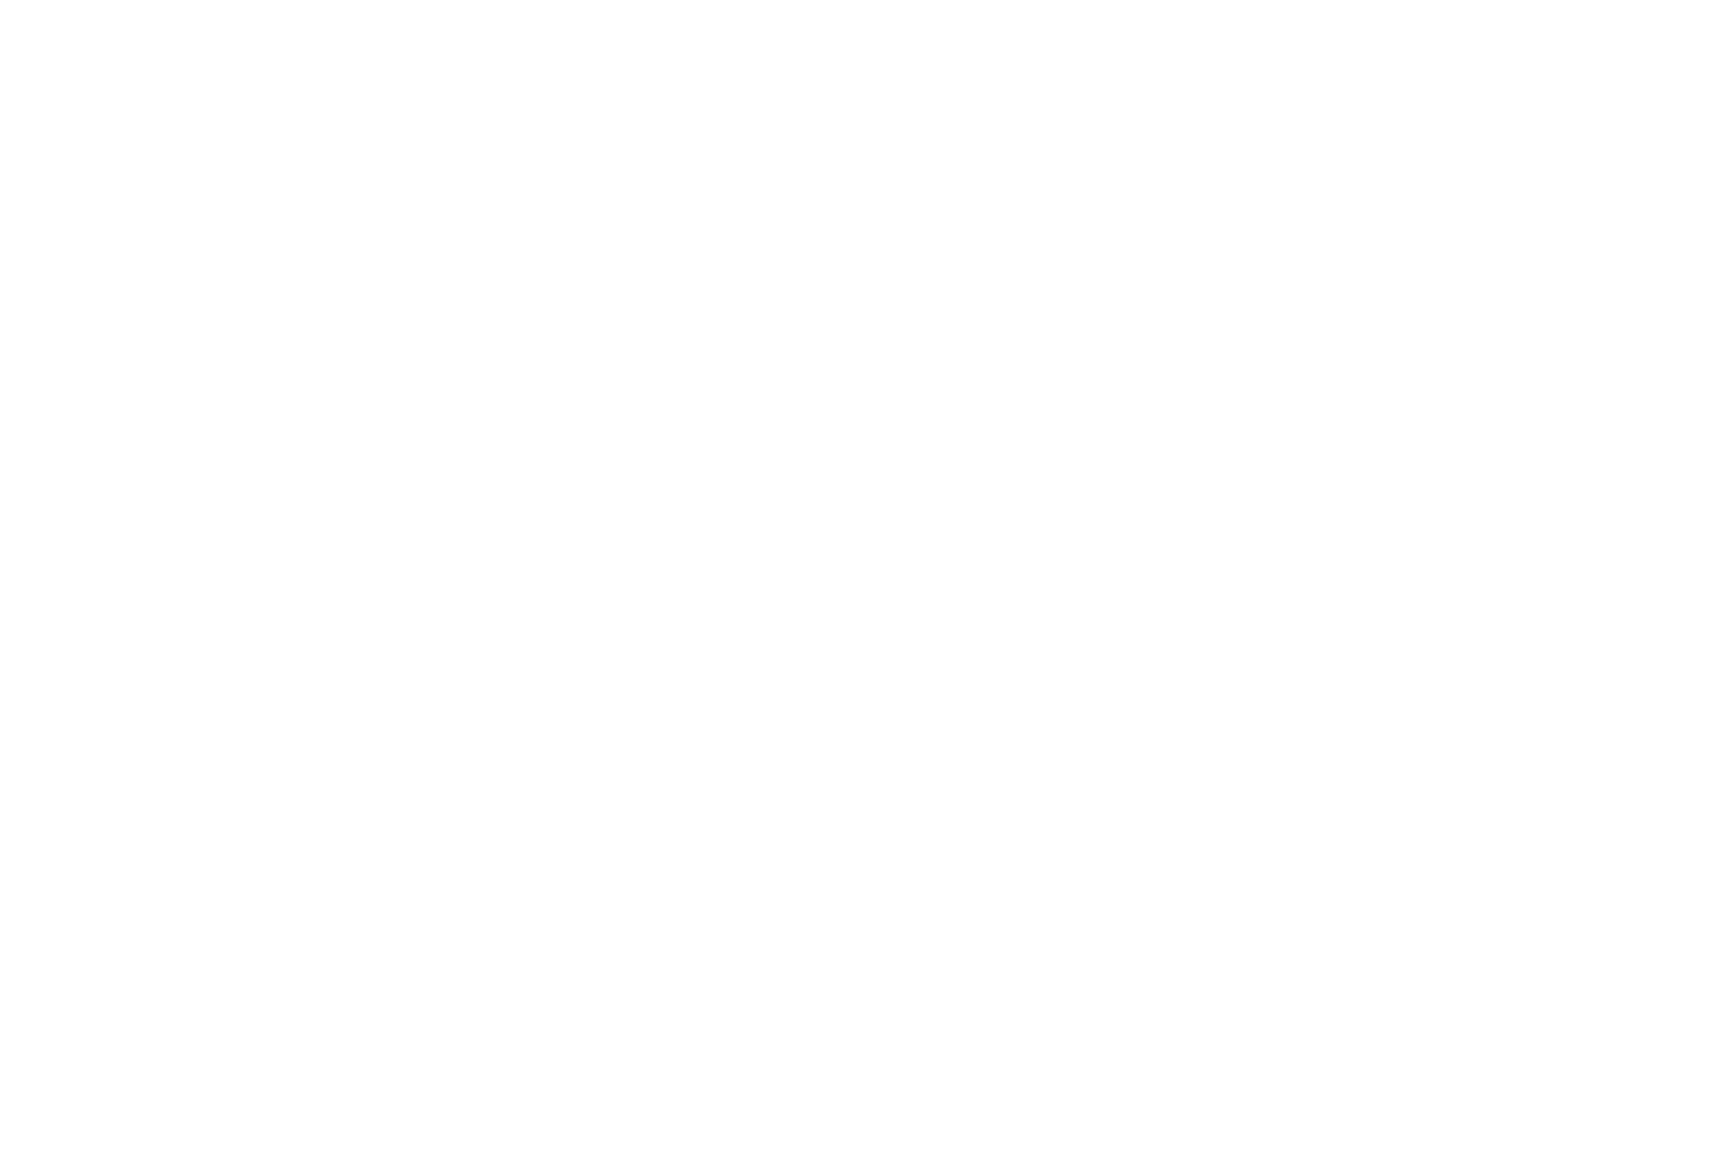 White - Reedy Reels - South Carolina Palmetto Prize Winner - 2018.png